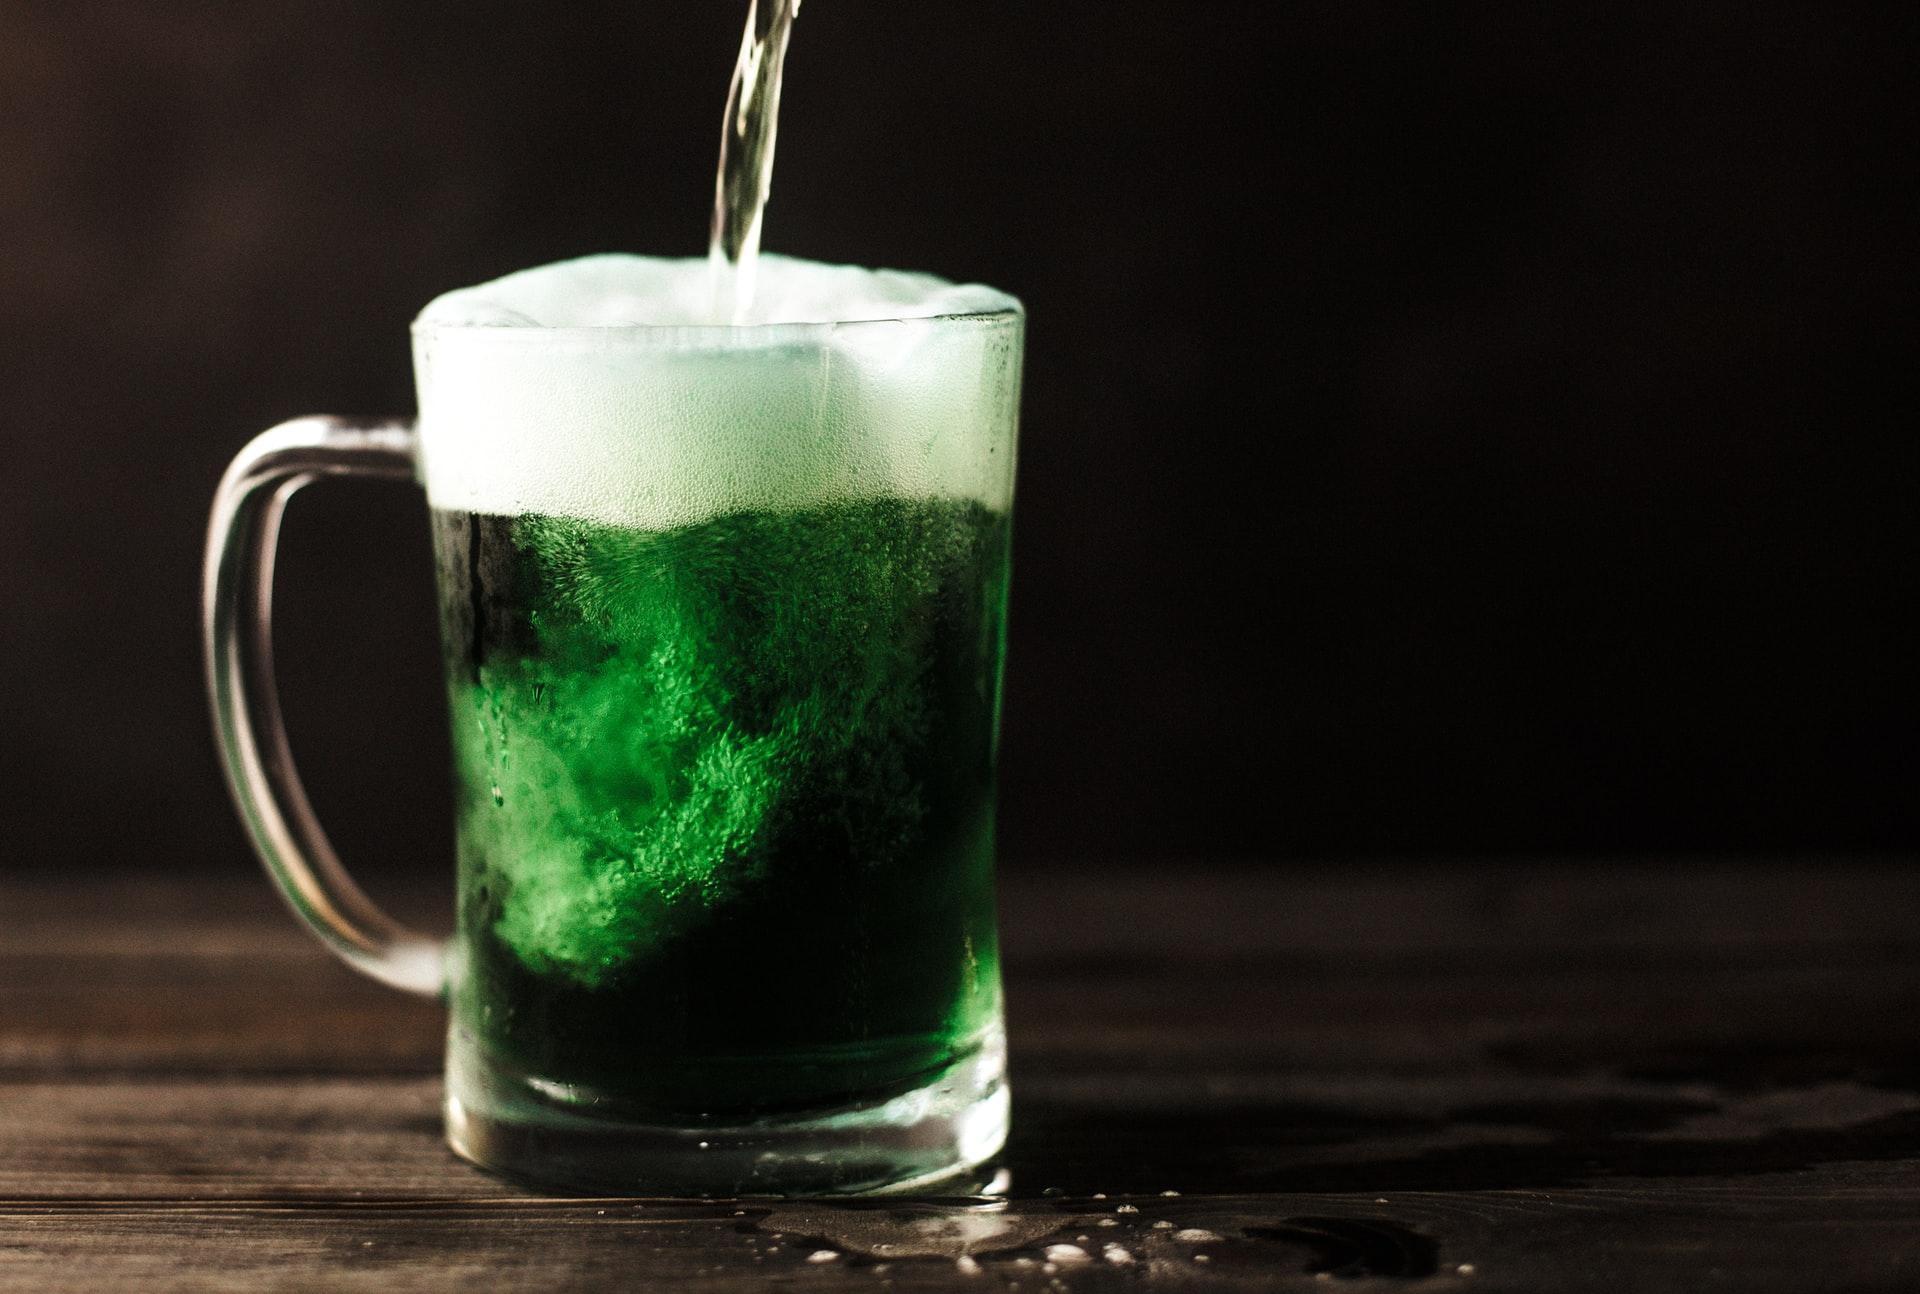 Celebrate St. Patrick's Day at The Kent House Irish Pub